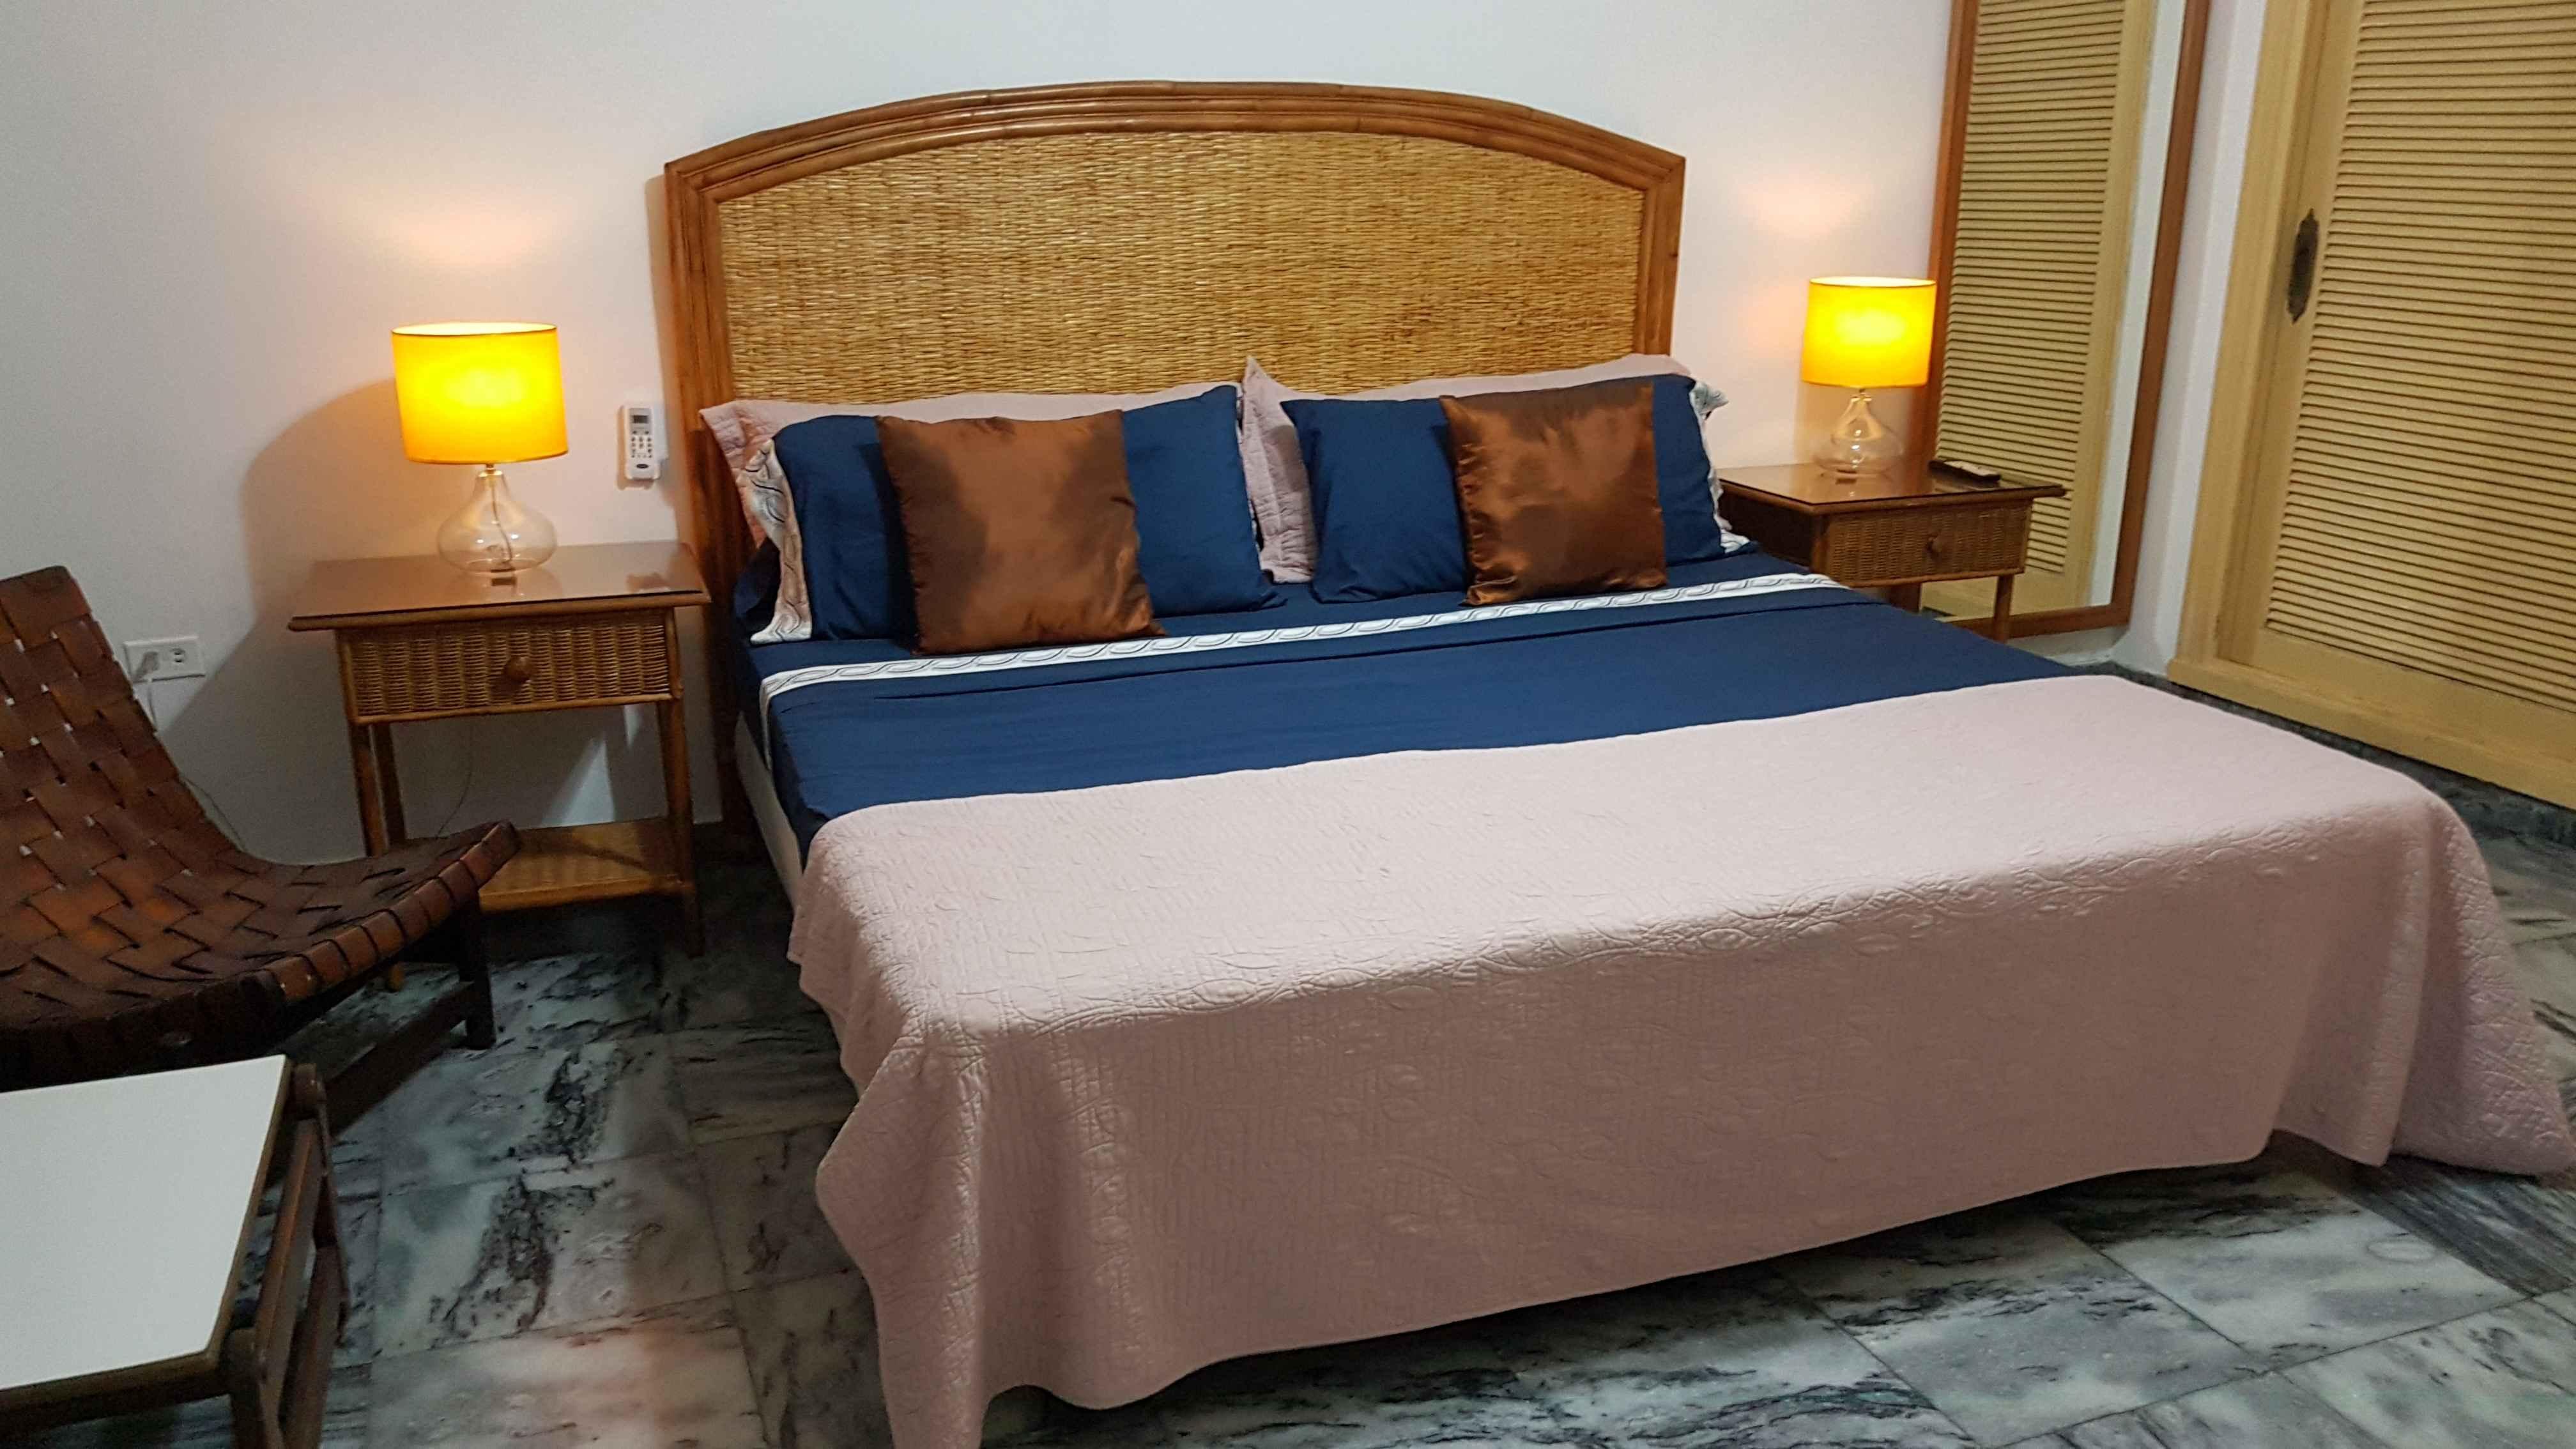 HAV406 – Room 3 Double room with shared bathroom